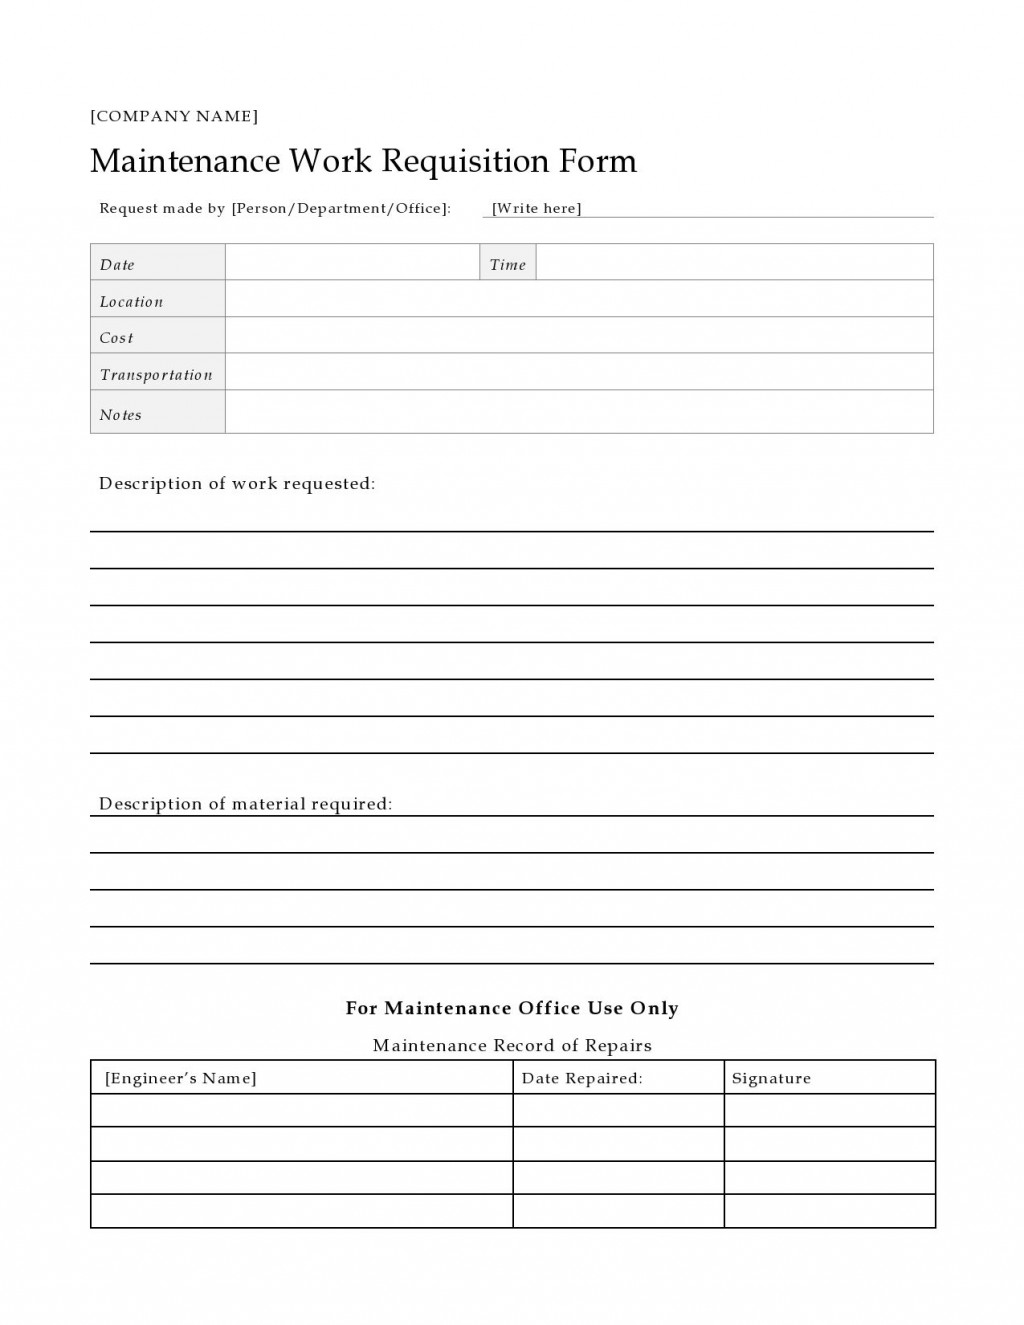 004 Unusual Maintenance Work Order Template Image  Form Free SampleLarge